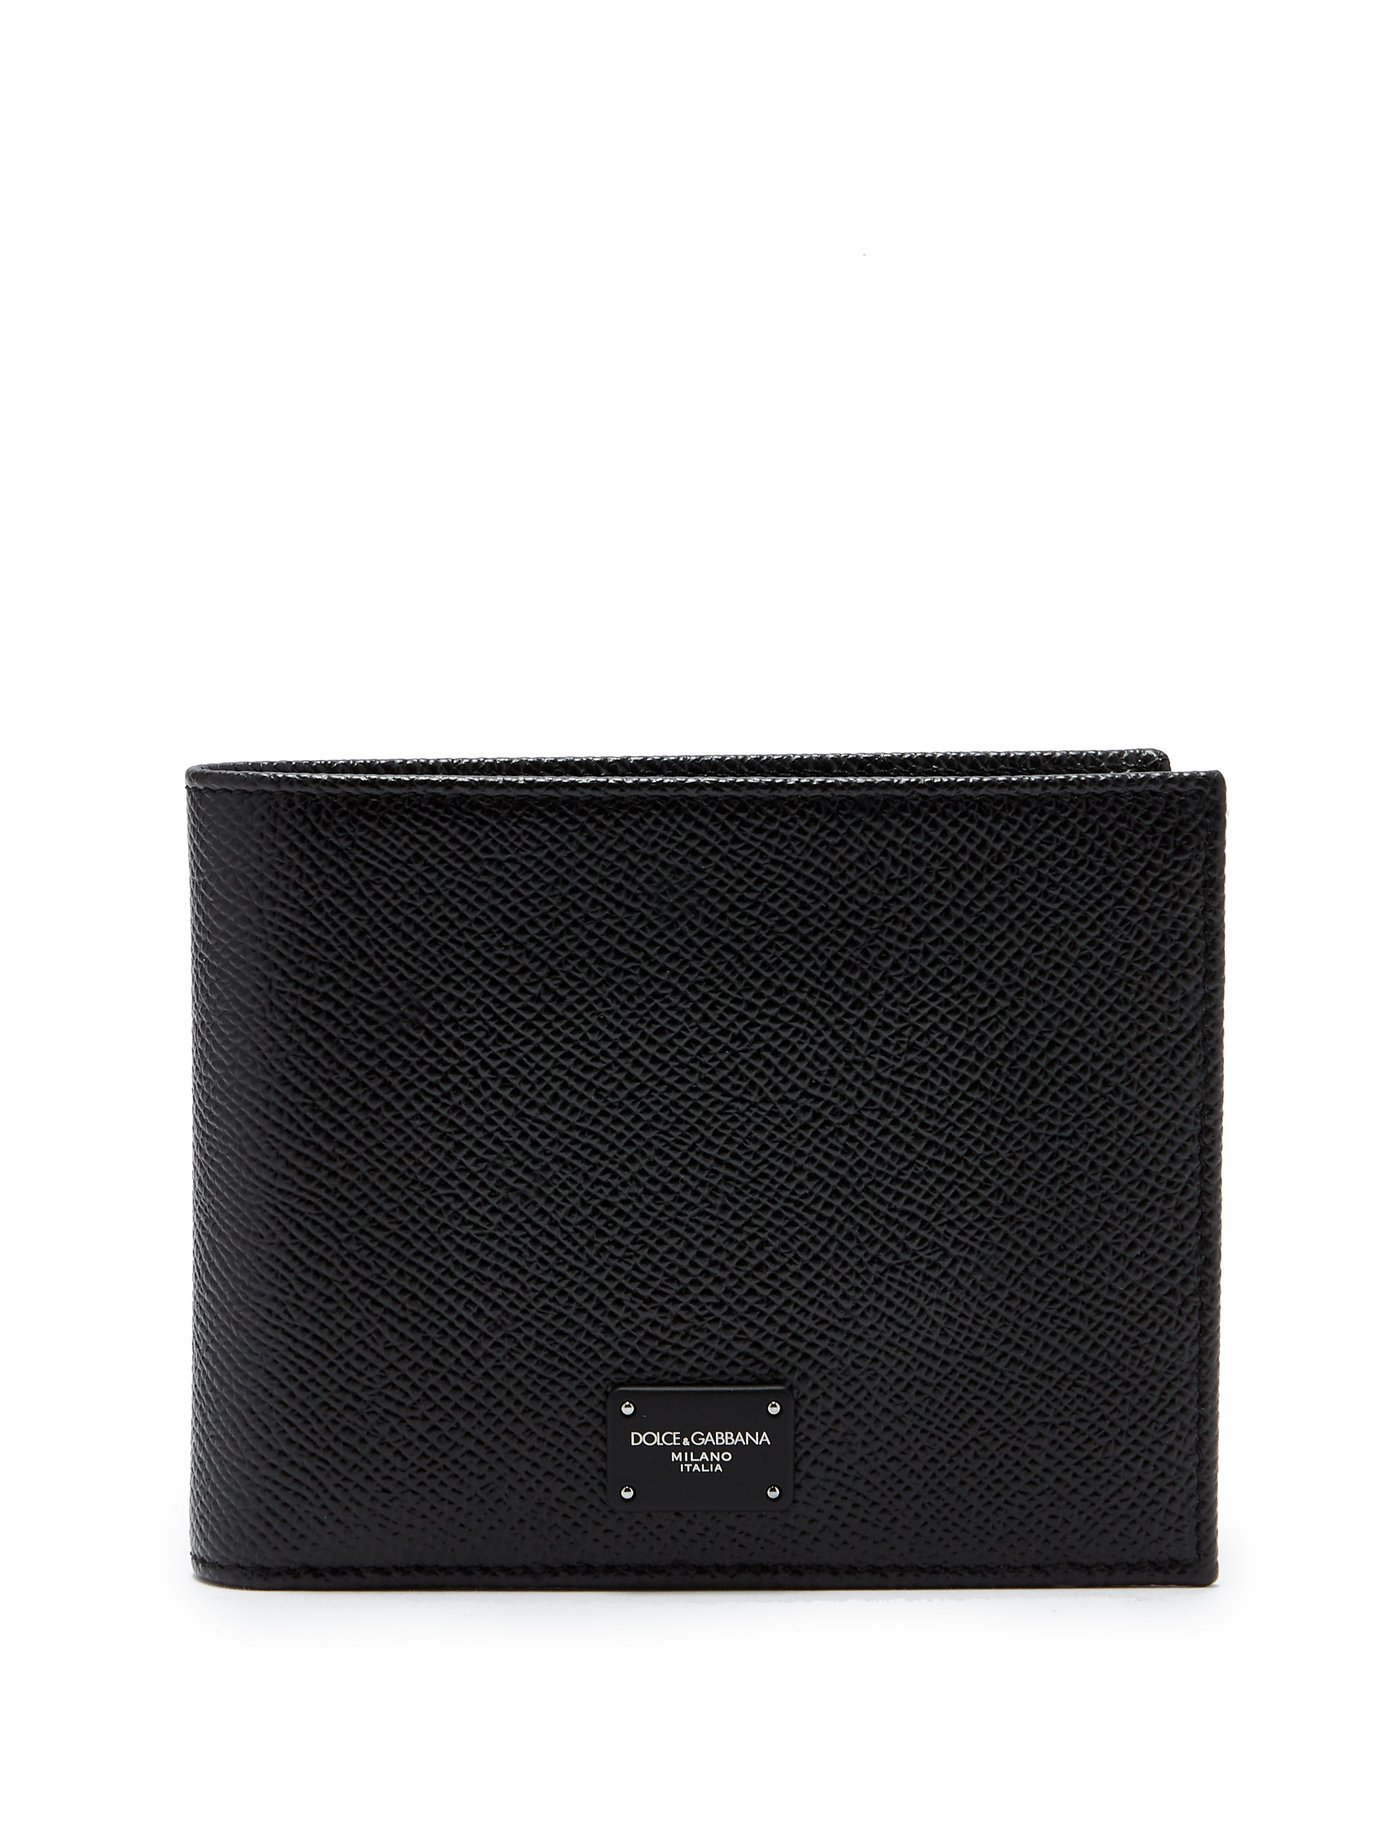 Bi-fold grained-leather wallet | Dolce & Gabbana | MATCHESFASHION.COM UK